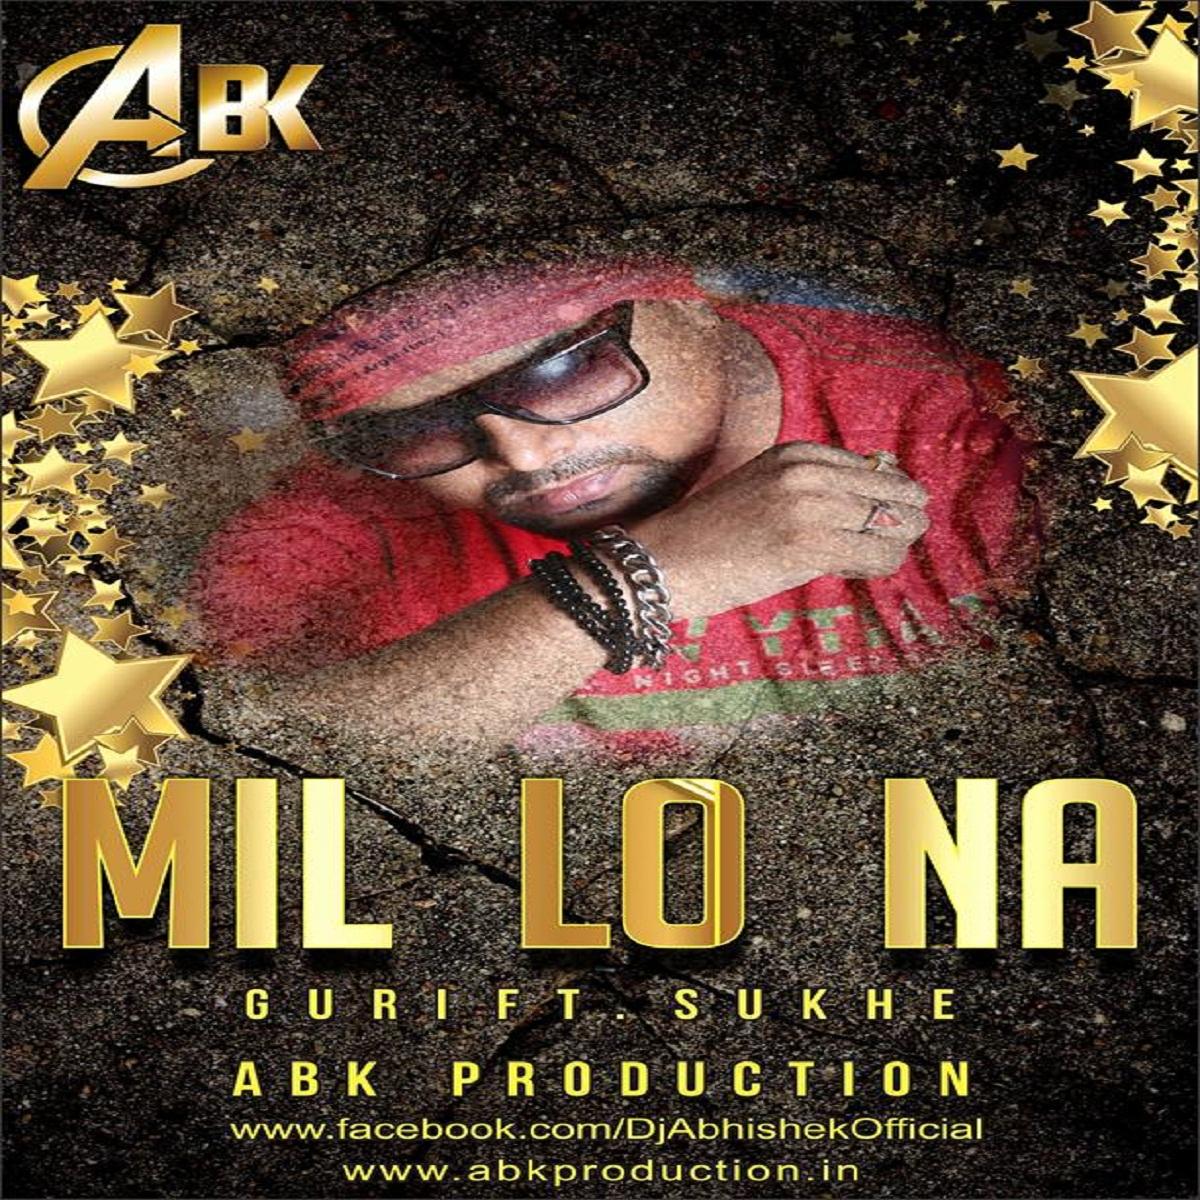 Download Sakhiyan: Mill Lo Na Guri Ft Sukhe ( Remix ) ABK Production